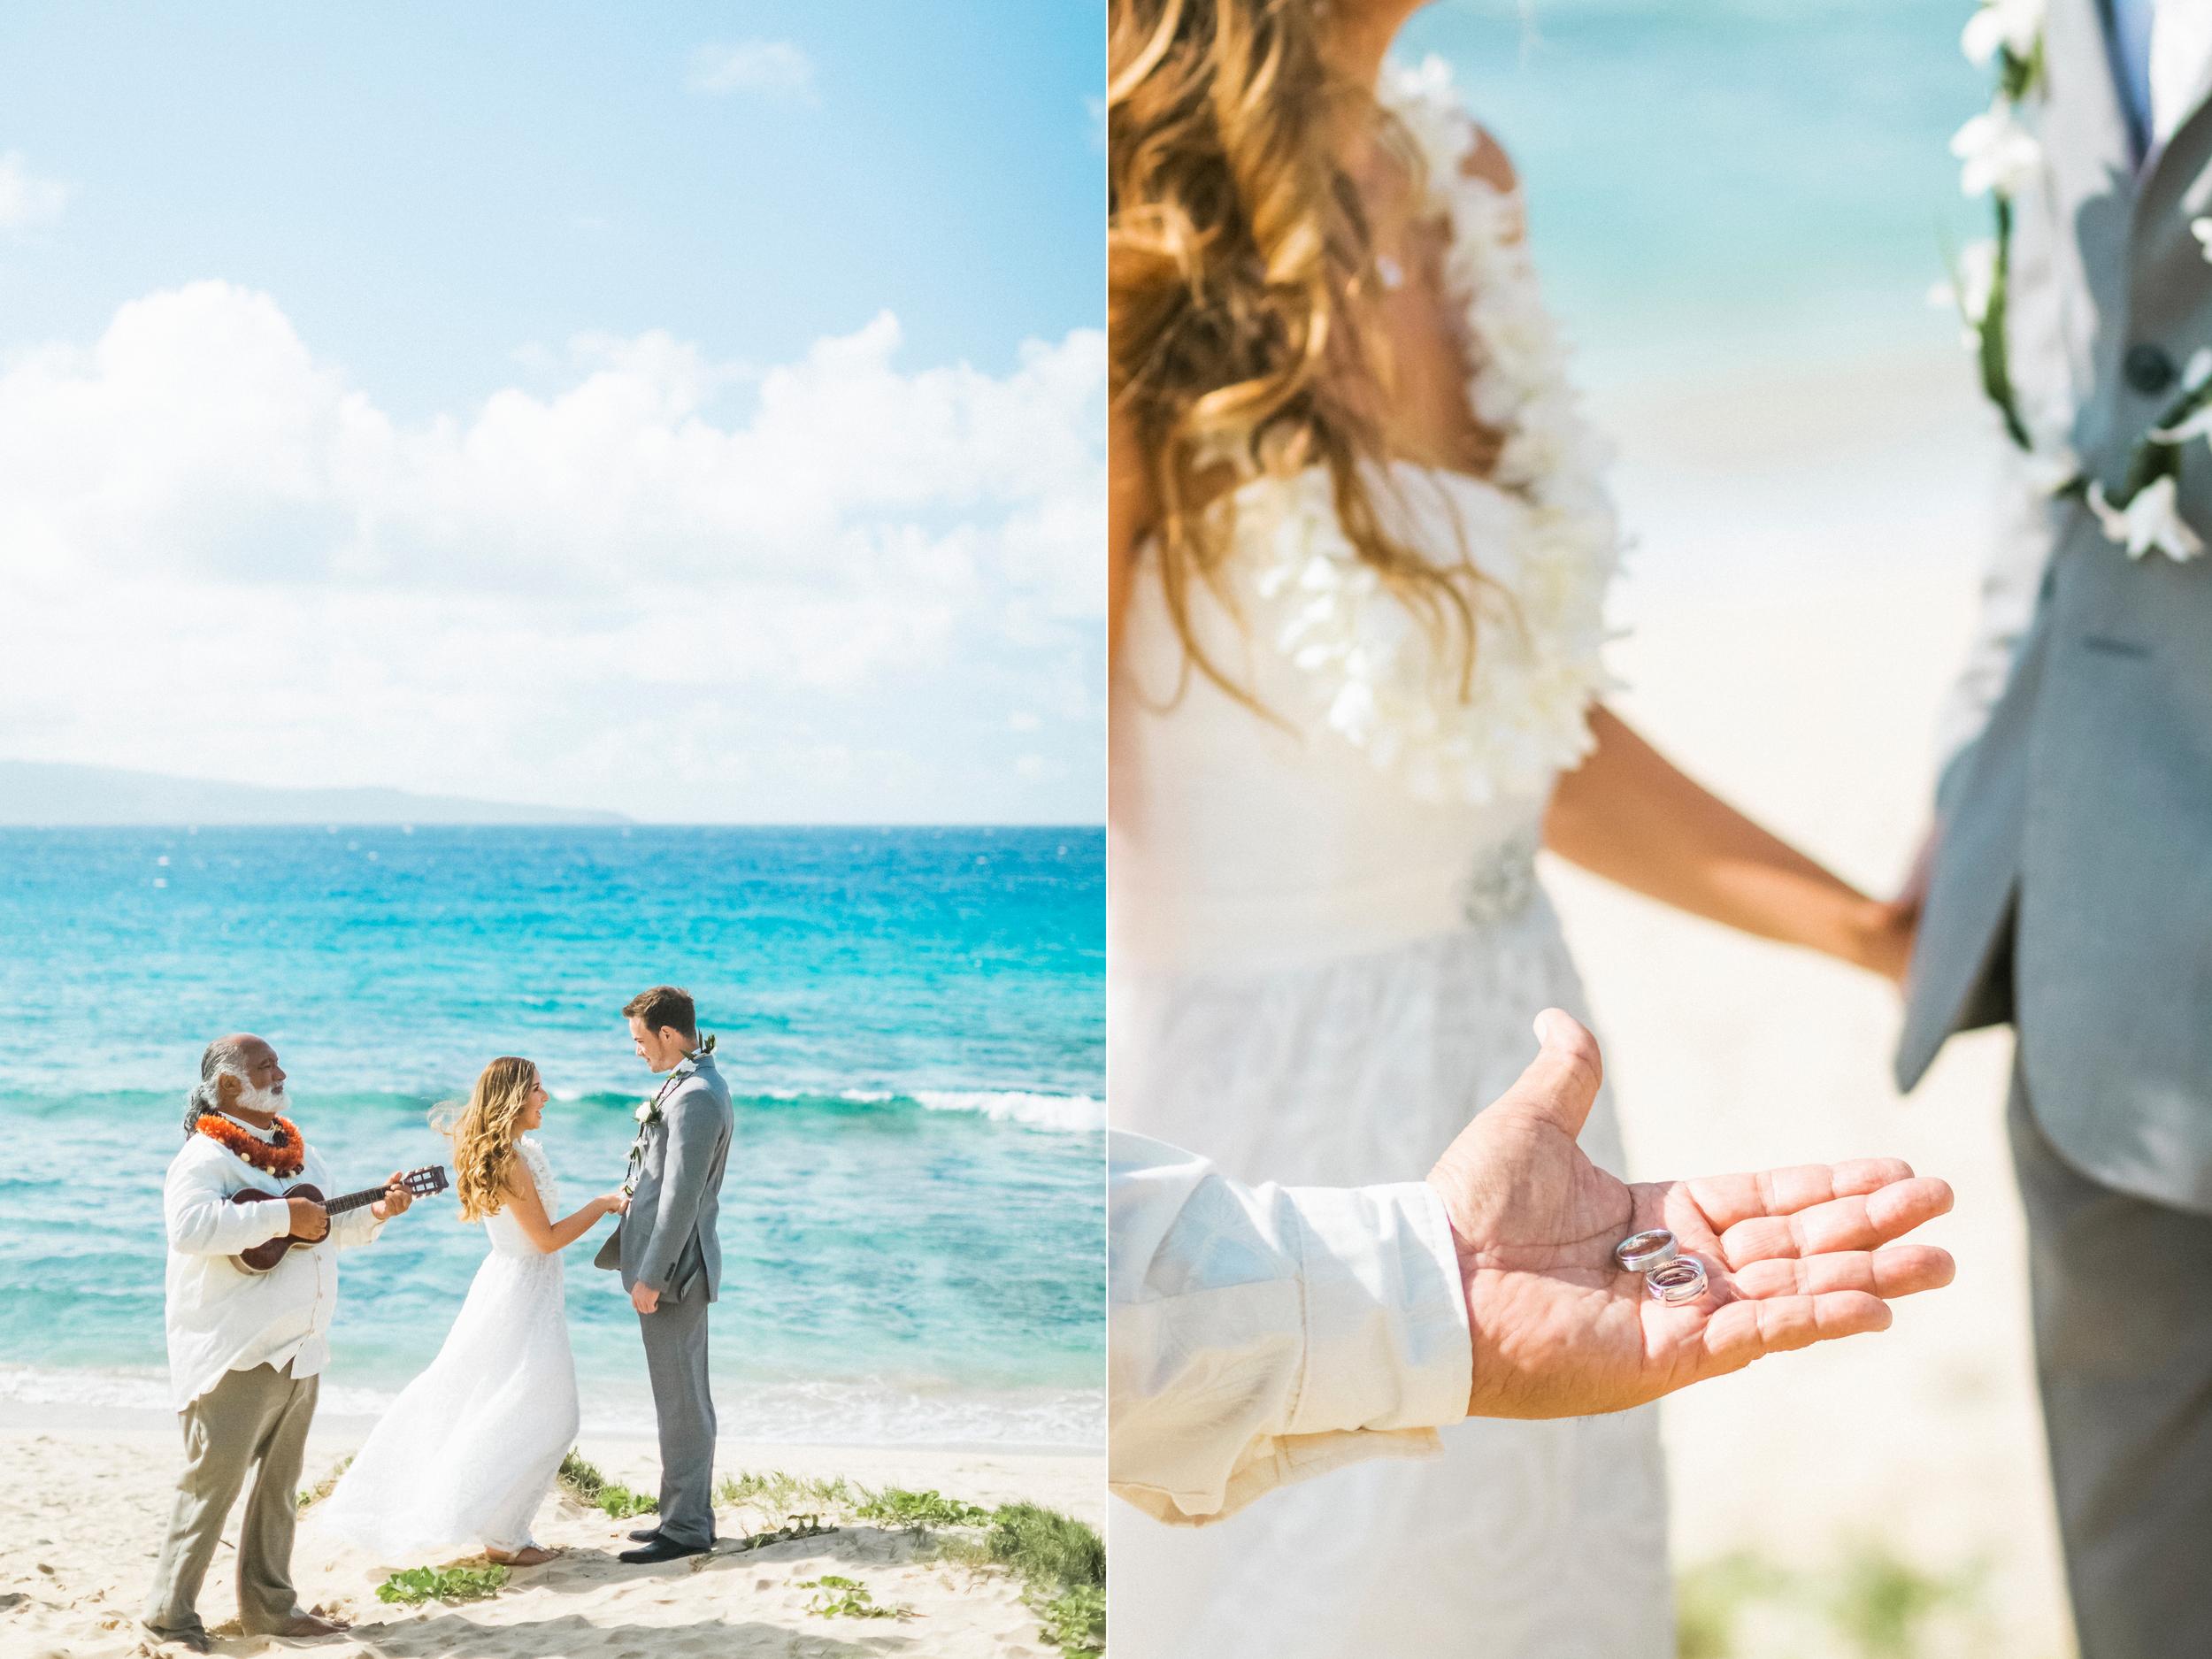 angie-diaz-photography-maui-ironwoods-beach-wedding-4.jpg